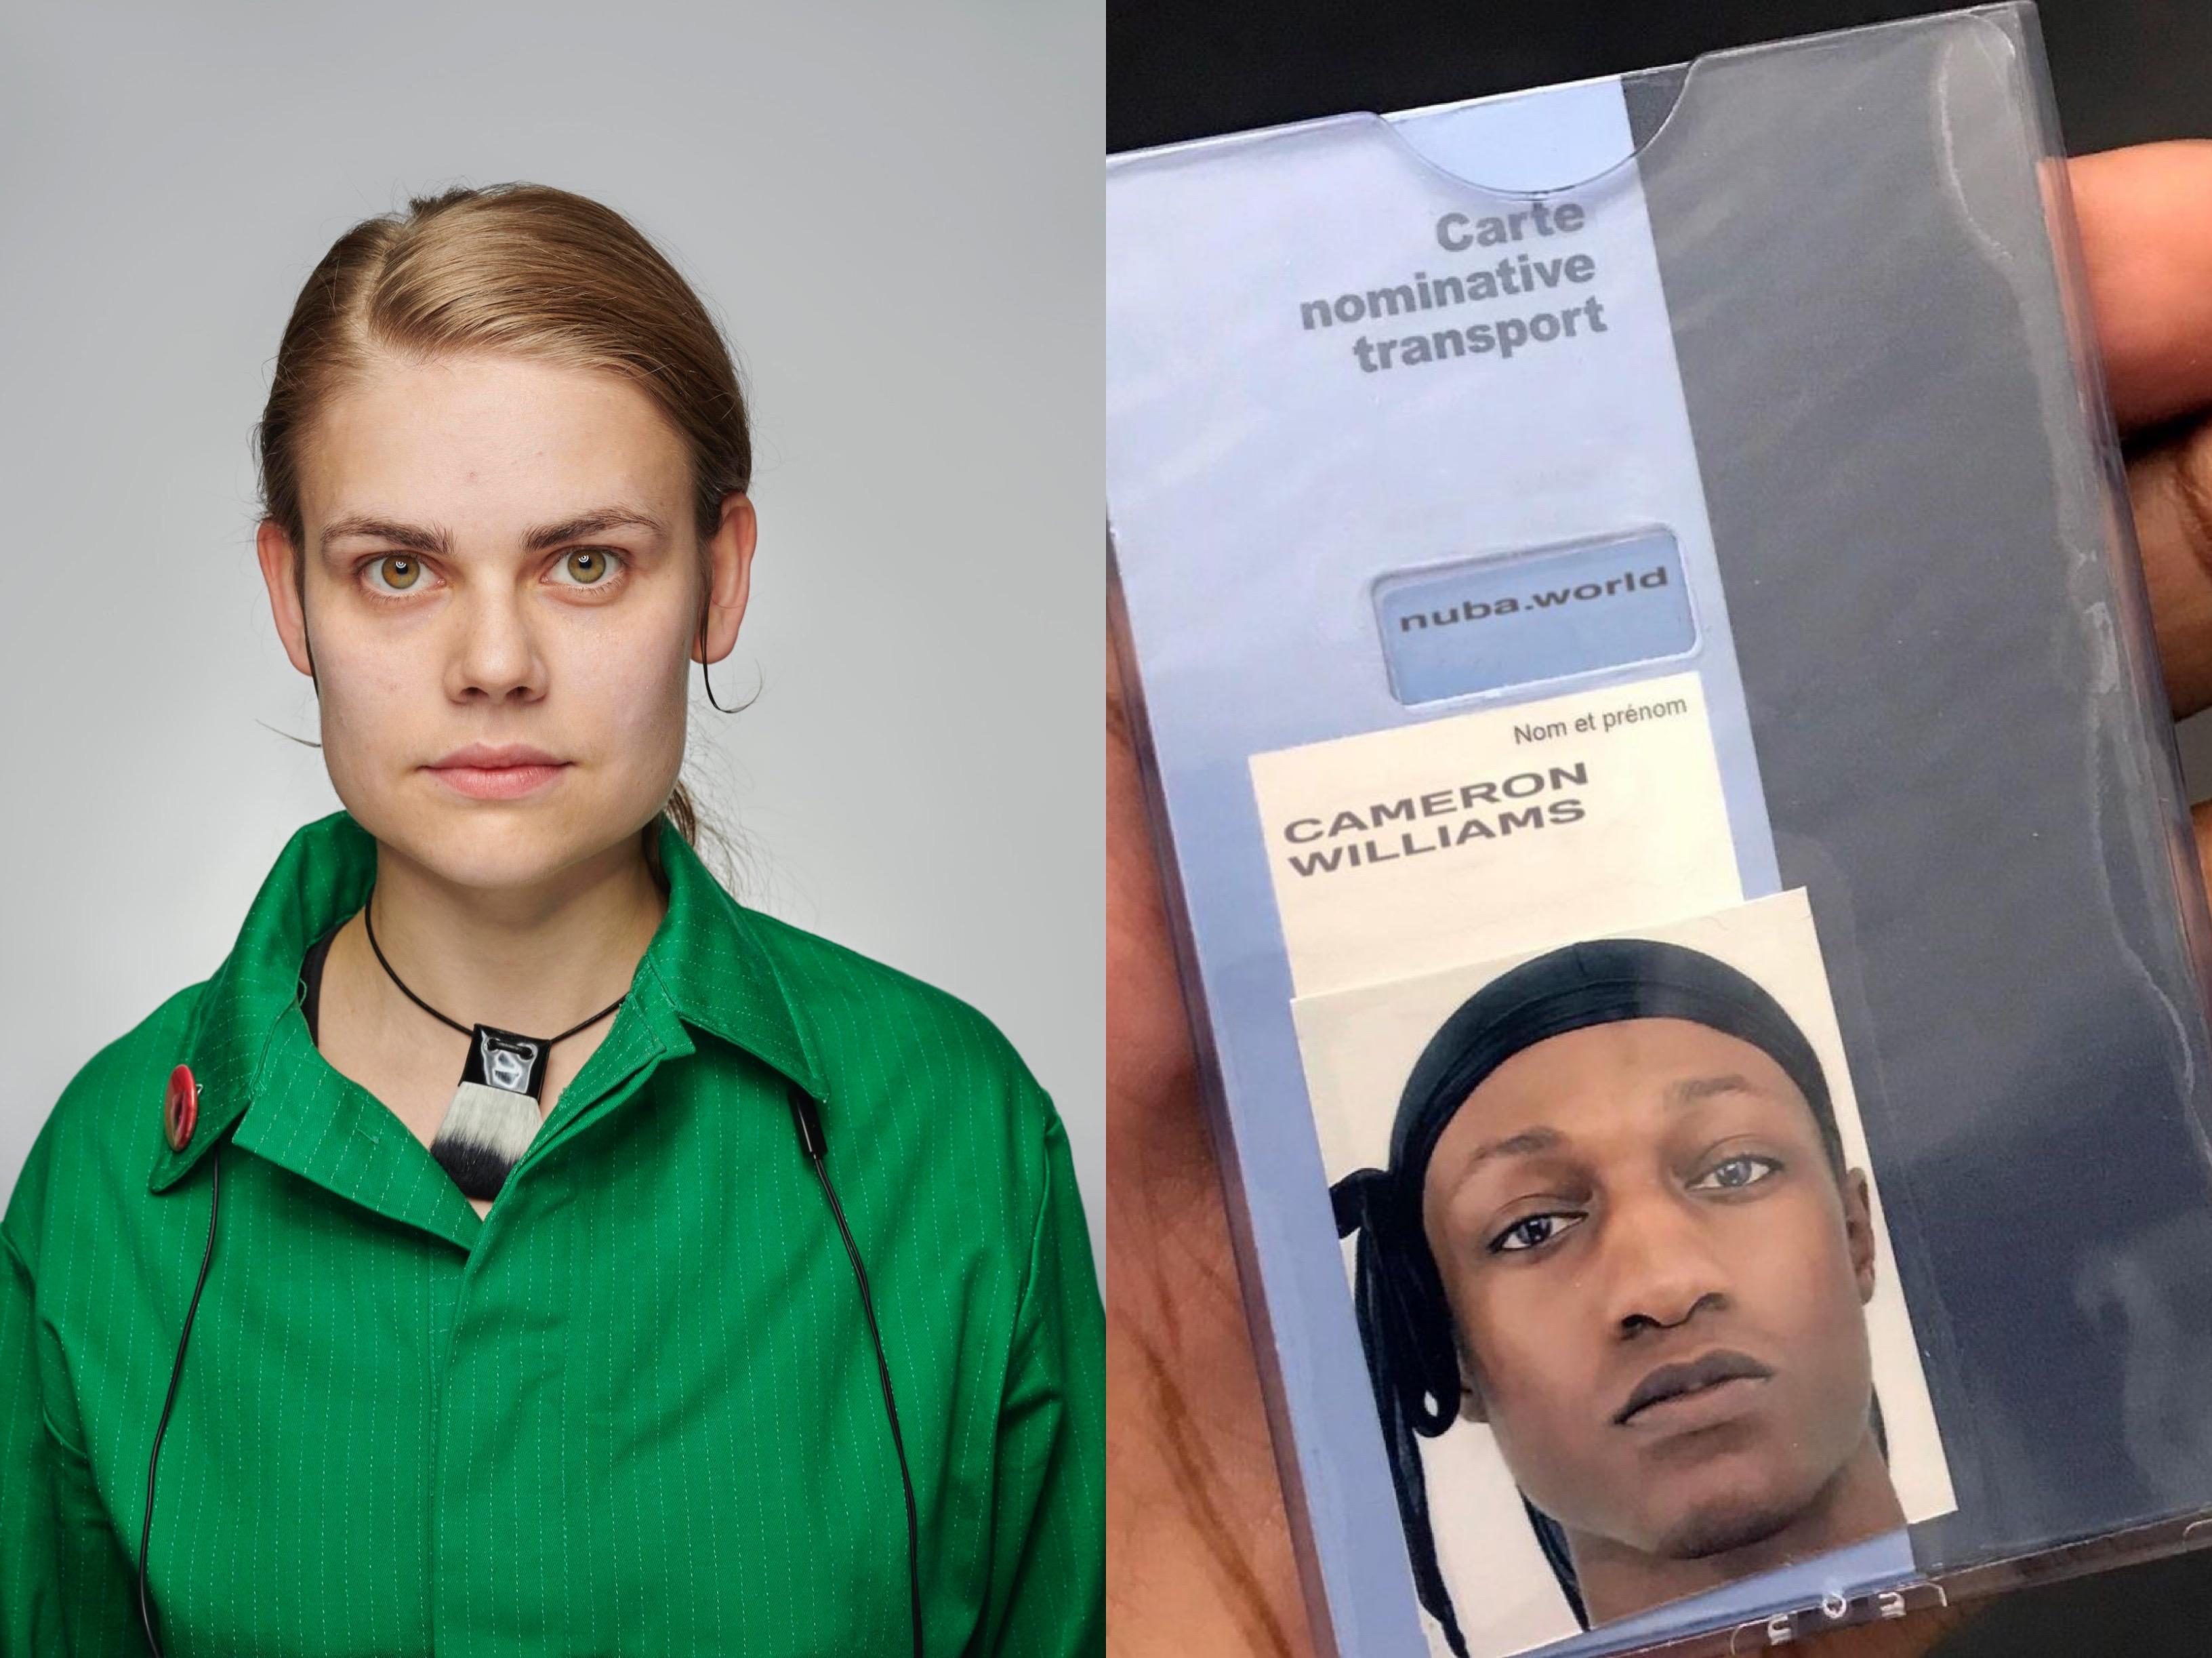 Estonian designer Johanna Parv and Cameron Williams behind the unisex label Nuba